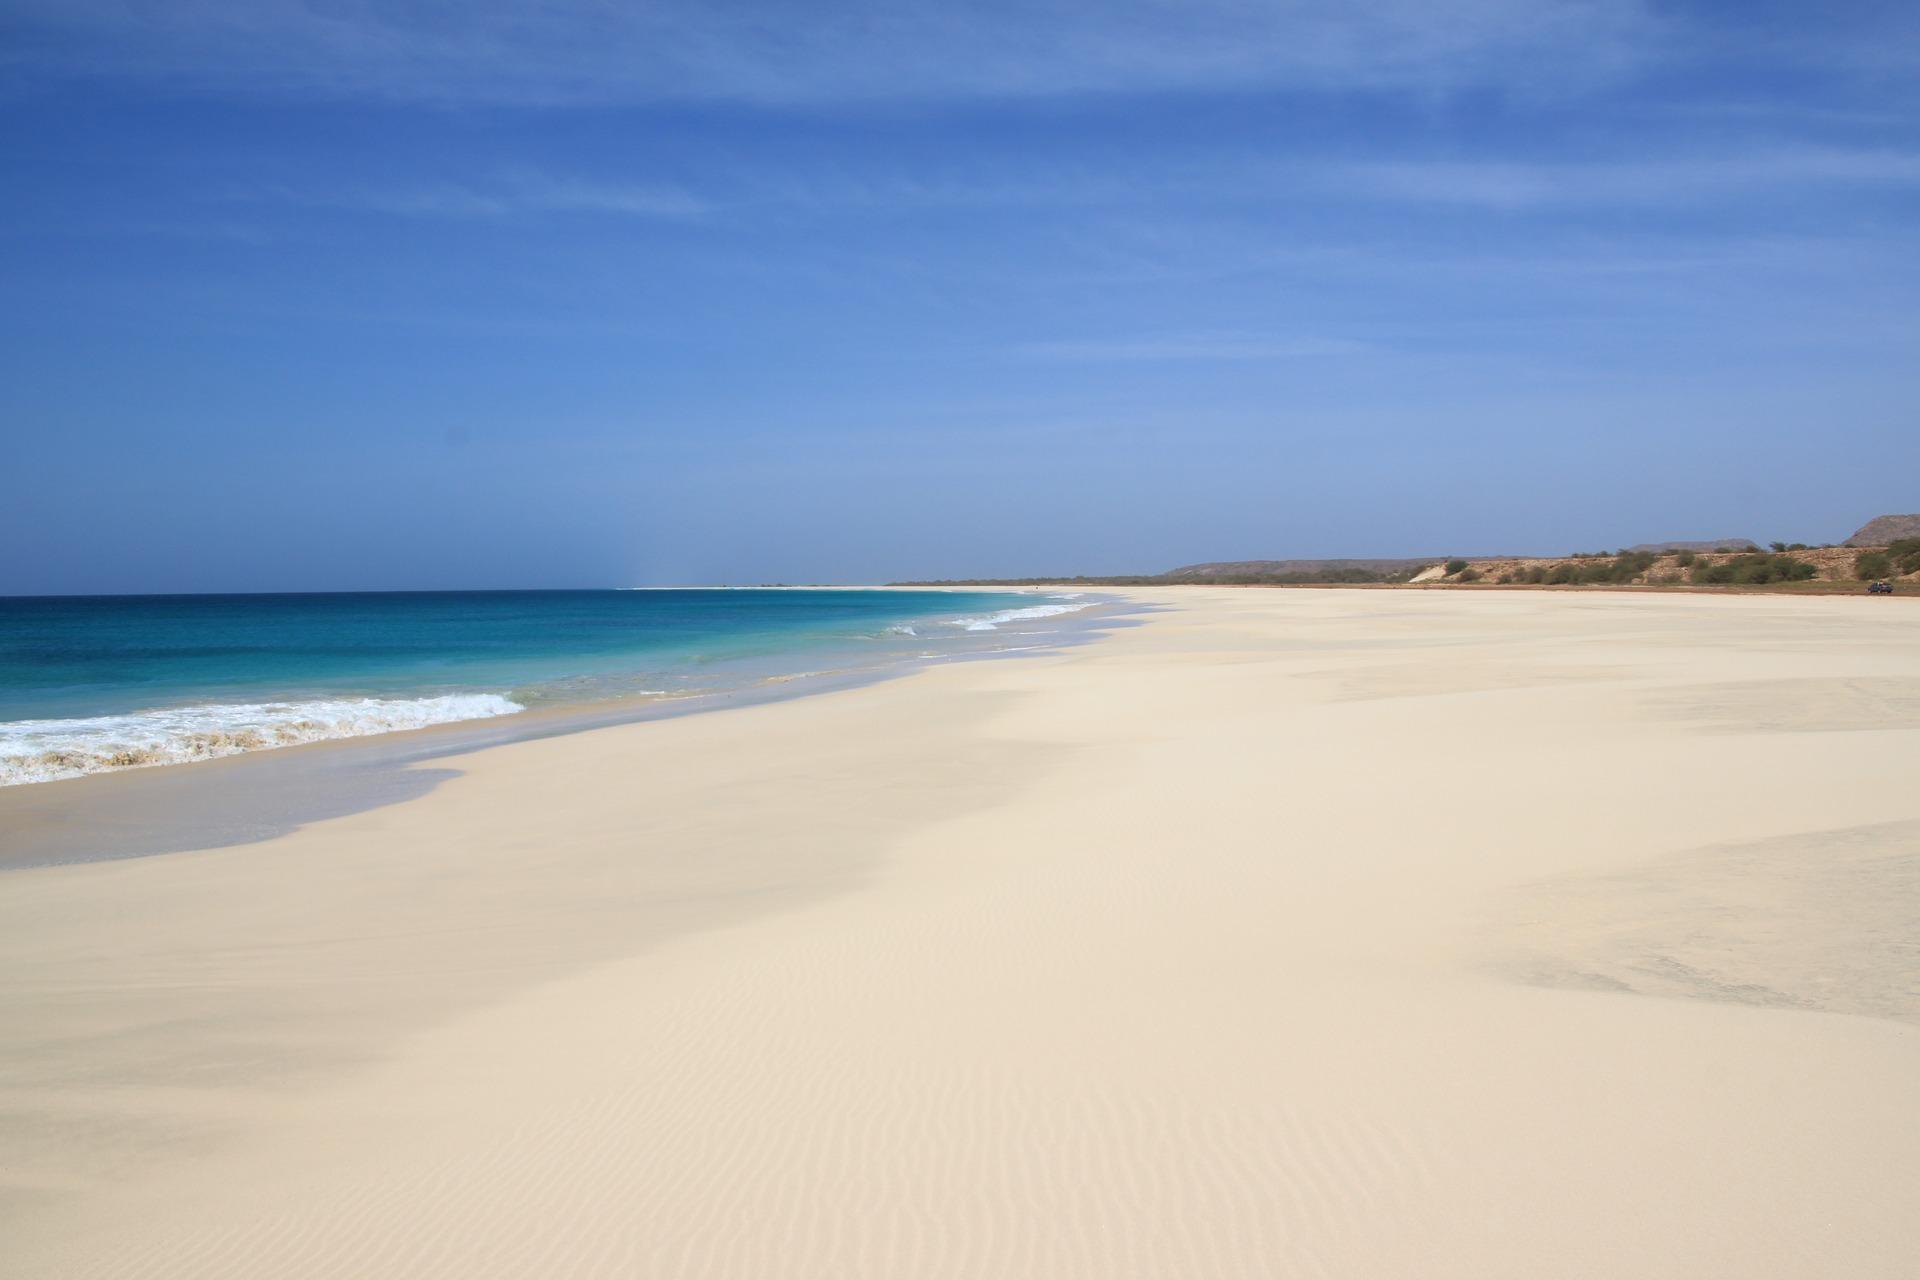 Agua Hotels Sal Vila Verde eine Woche ab 392,00€ Pauschal Deal